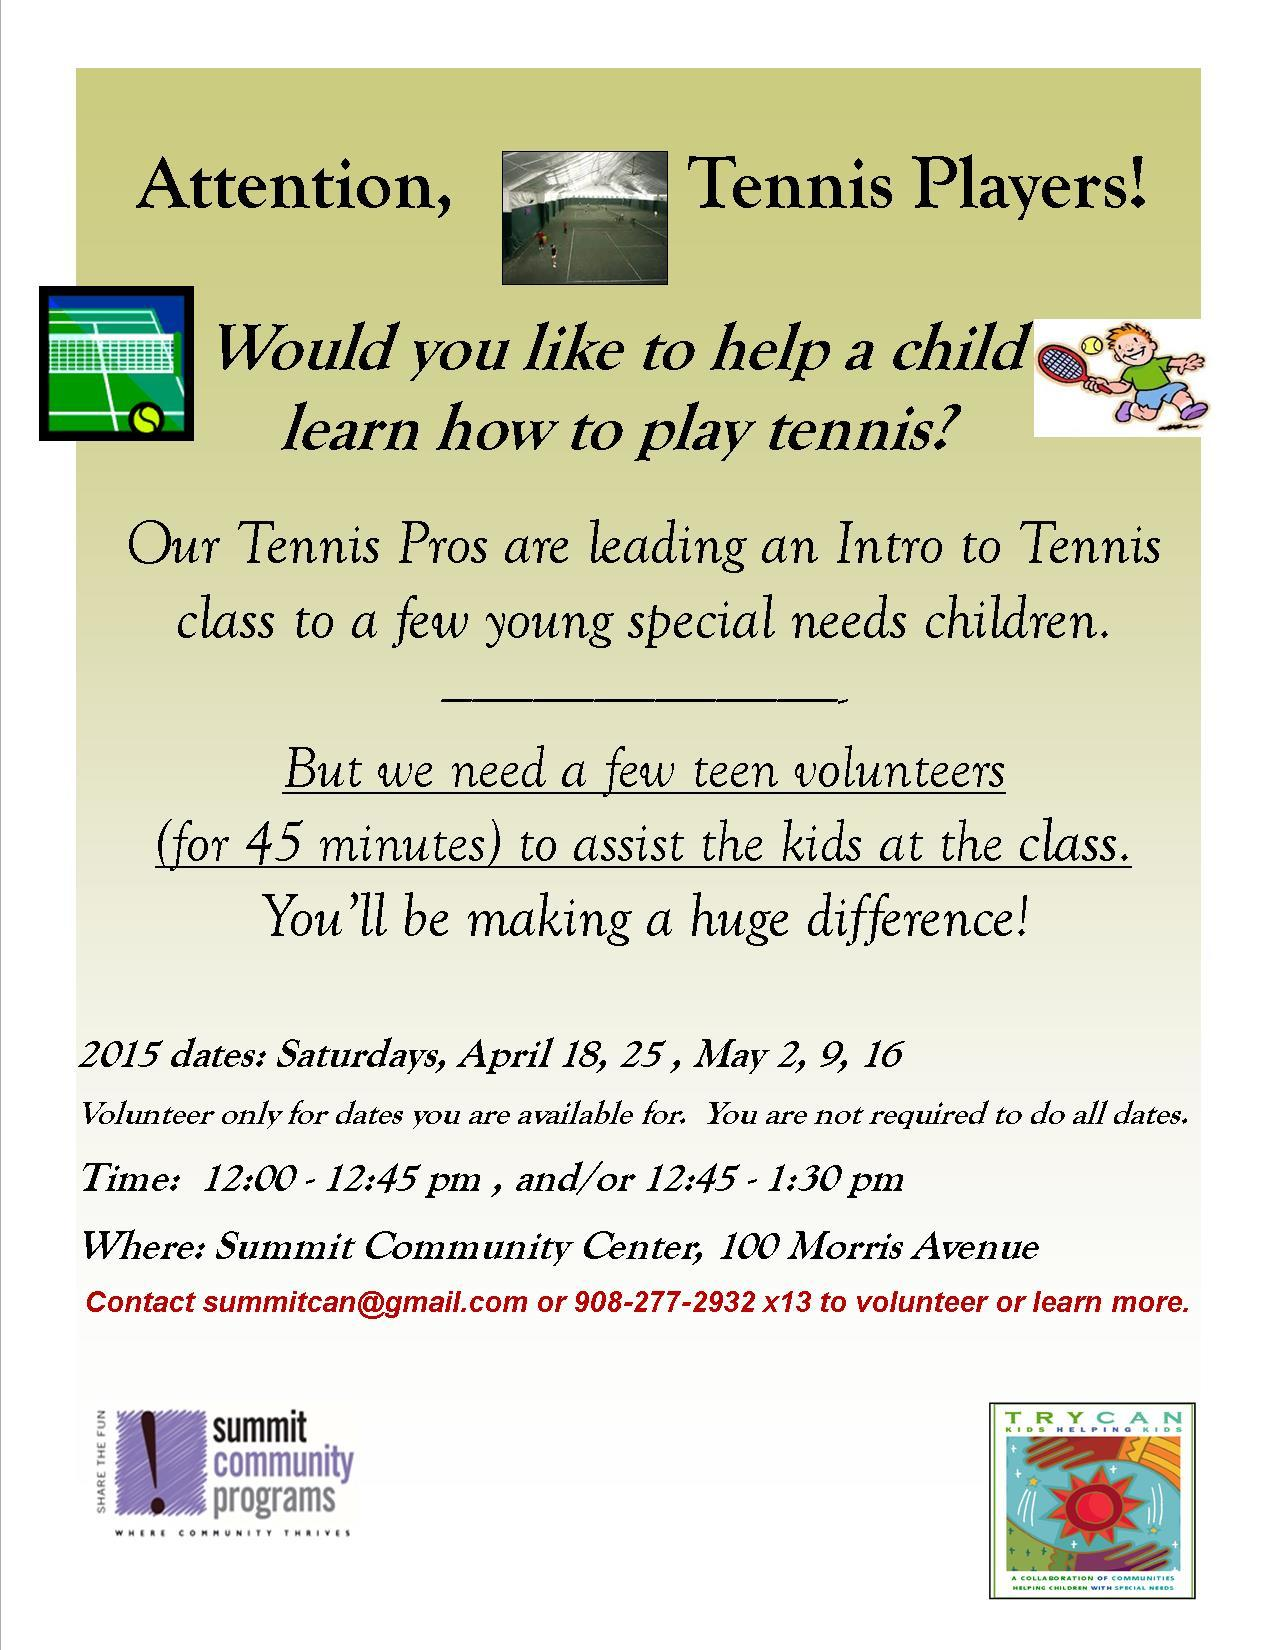 3179145eccbd5f76f85d_tennis_volunteers_flyer_April_2015.jpg